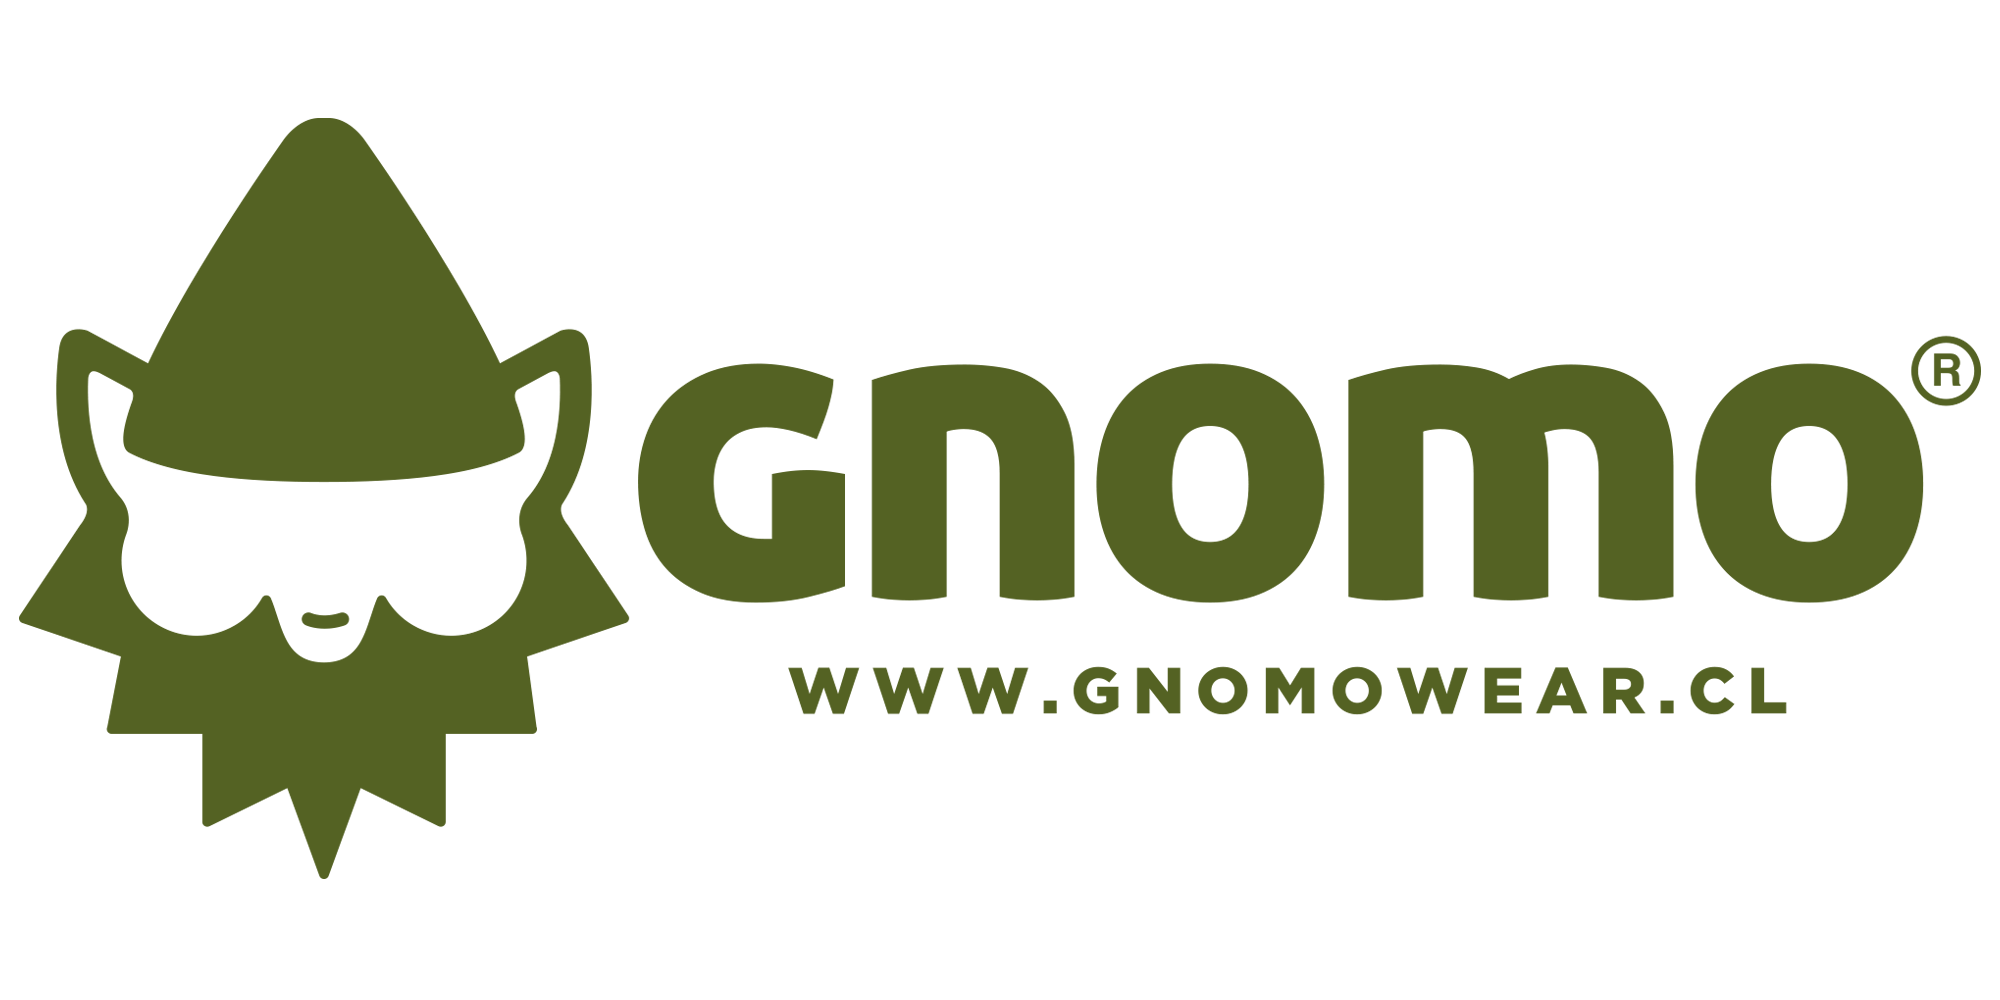 Empresas Desafio10x: Vestuarios Gnomowear Ltda